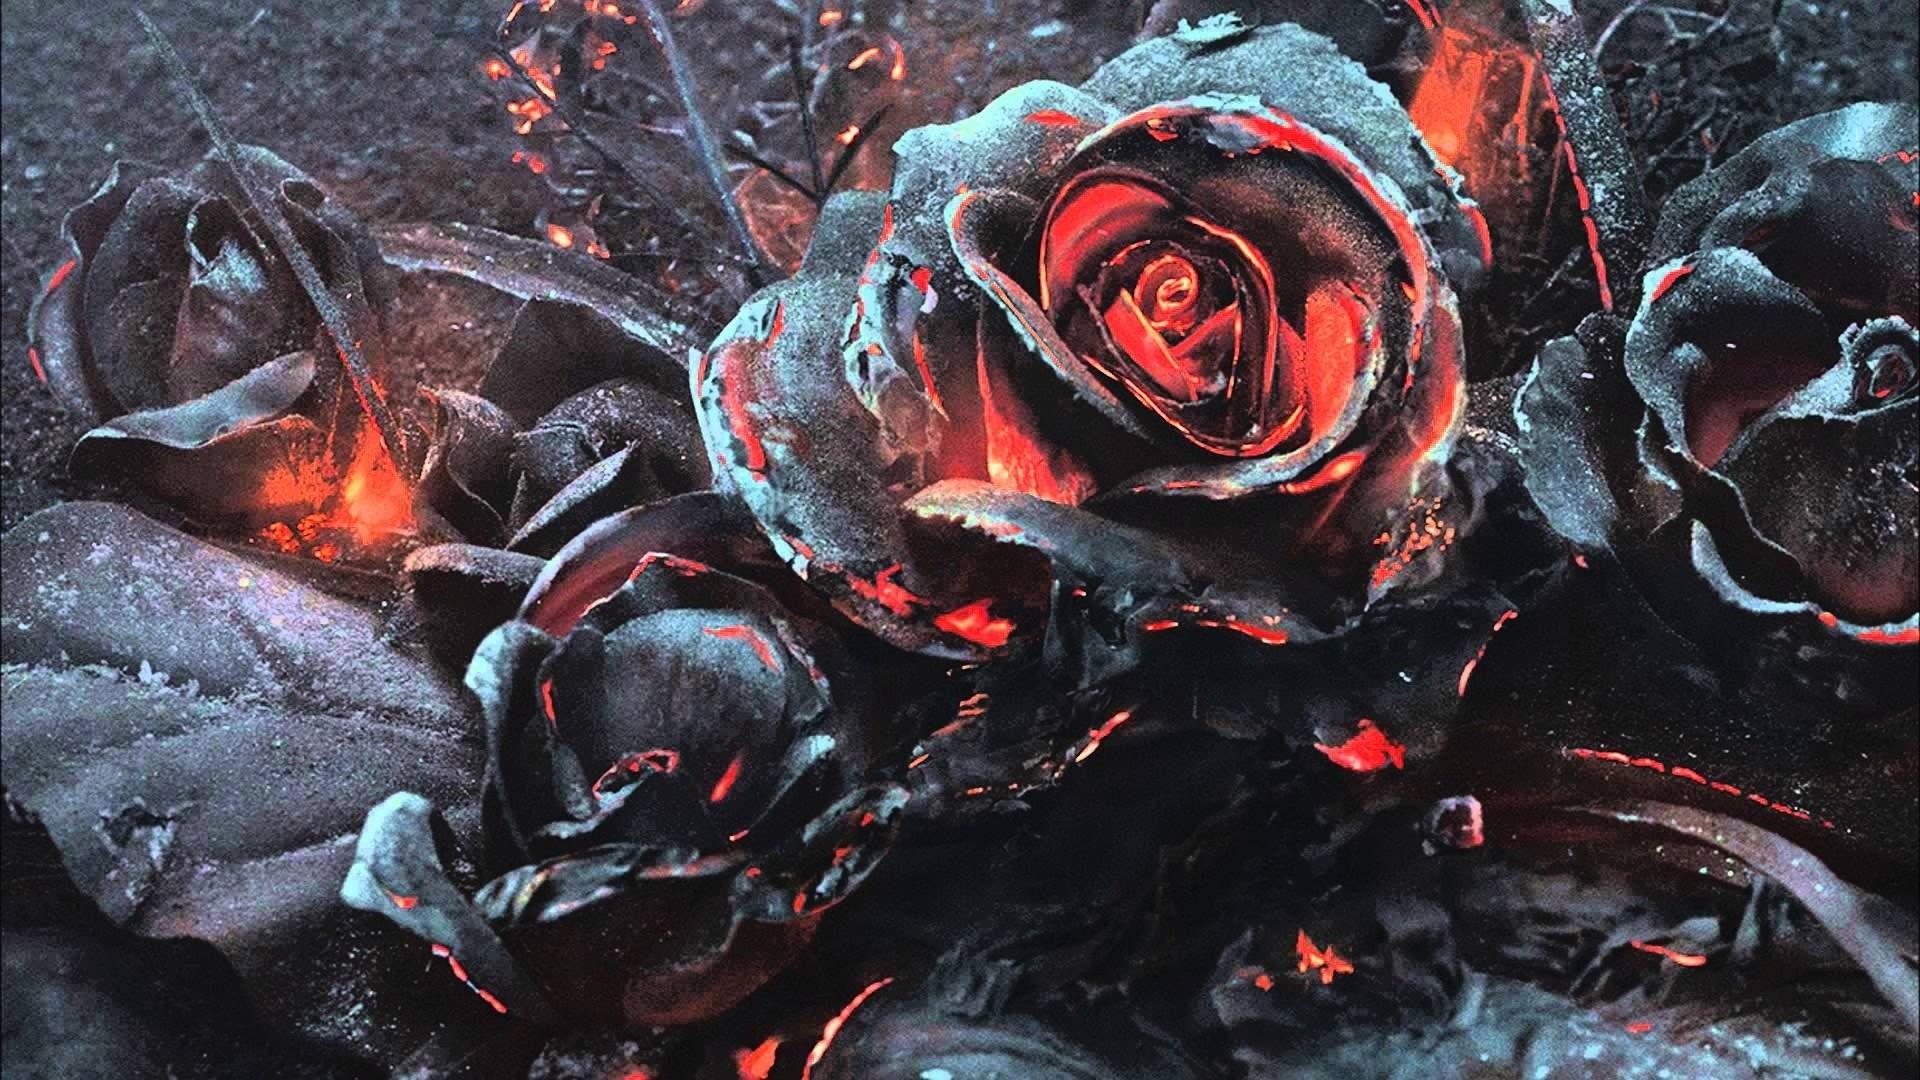 Dead Rose Desktop Wallpaper